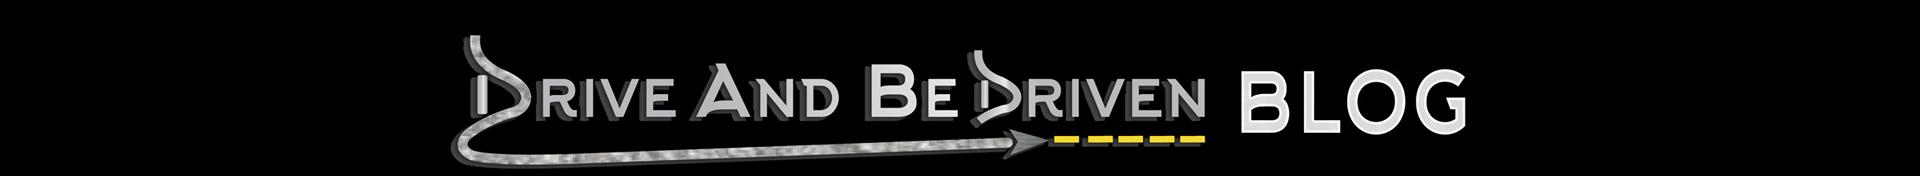 DriveAndBeDriven Blog